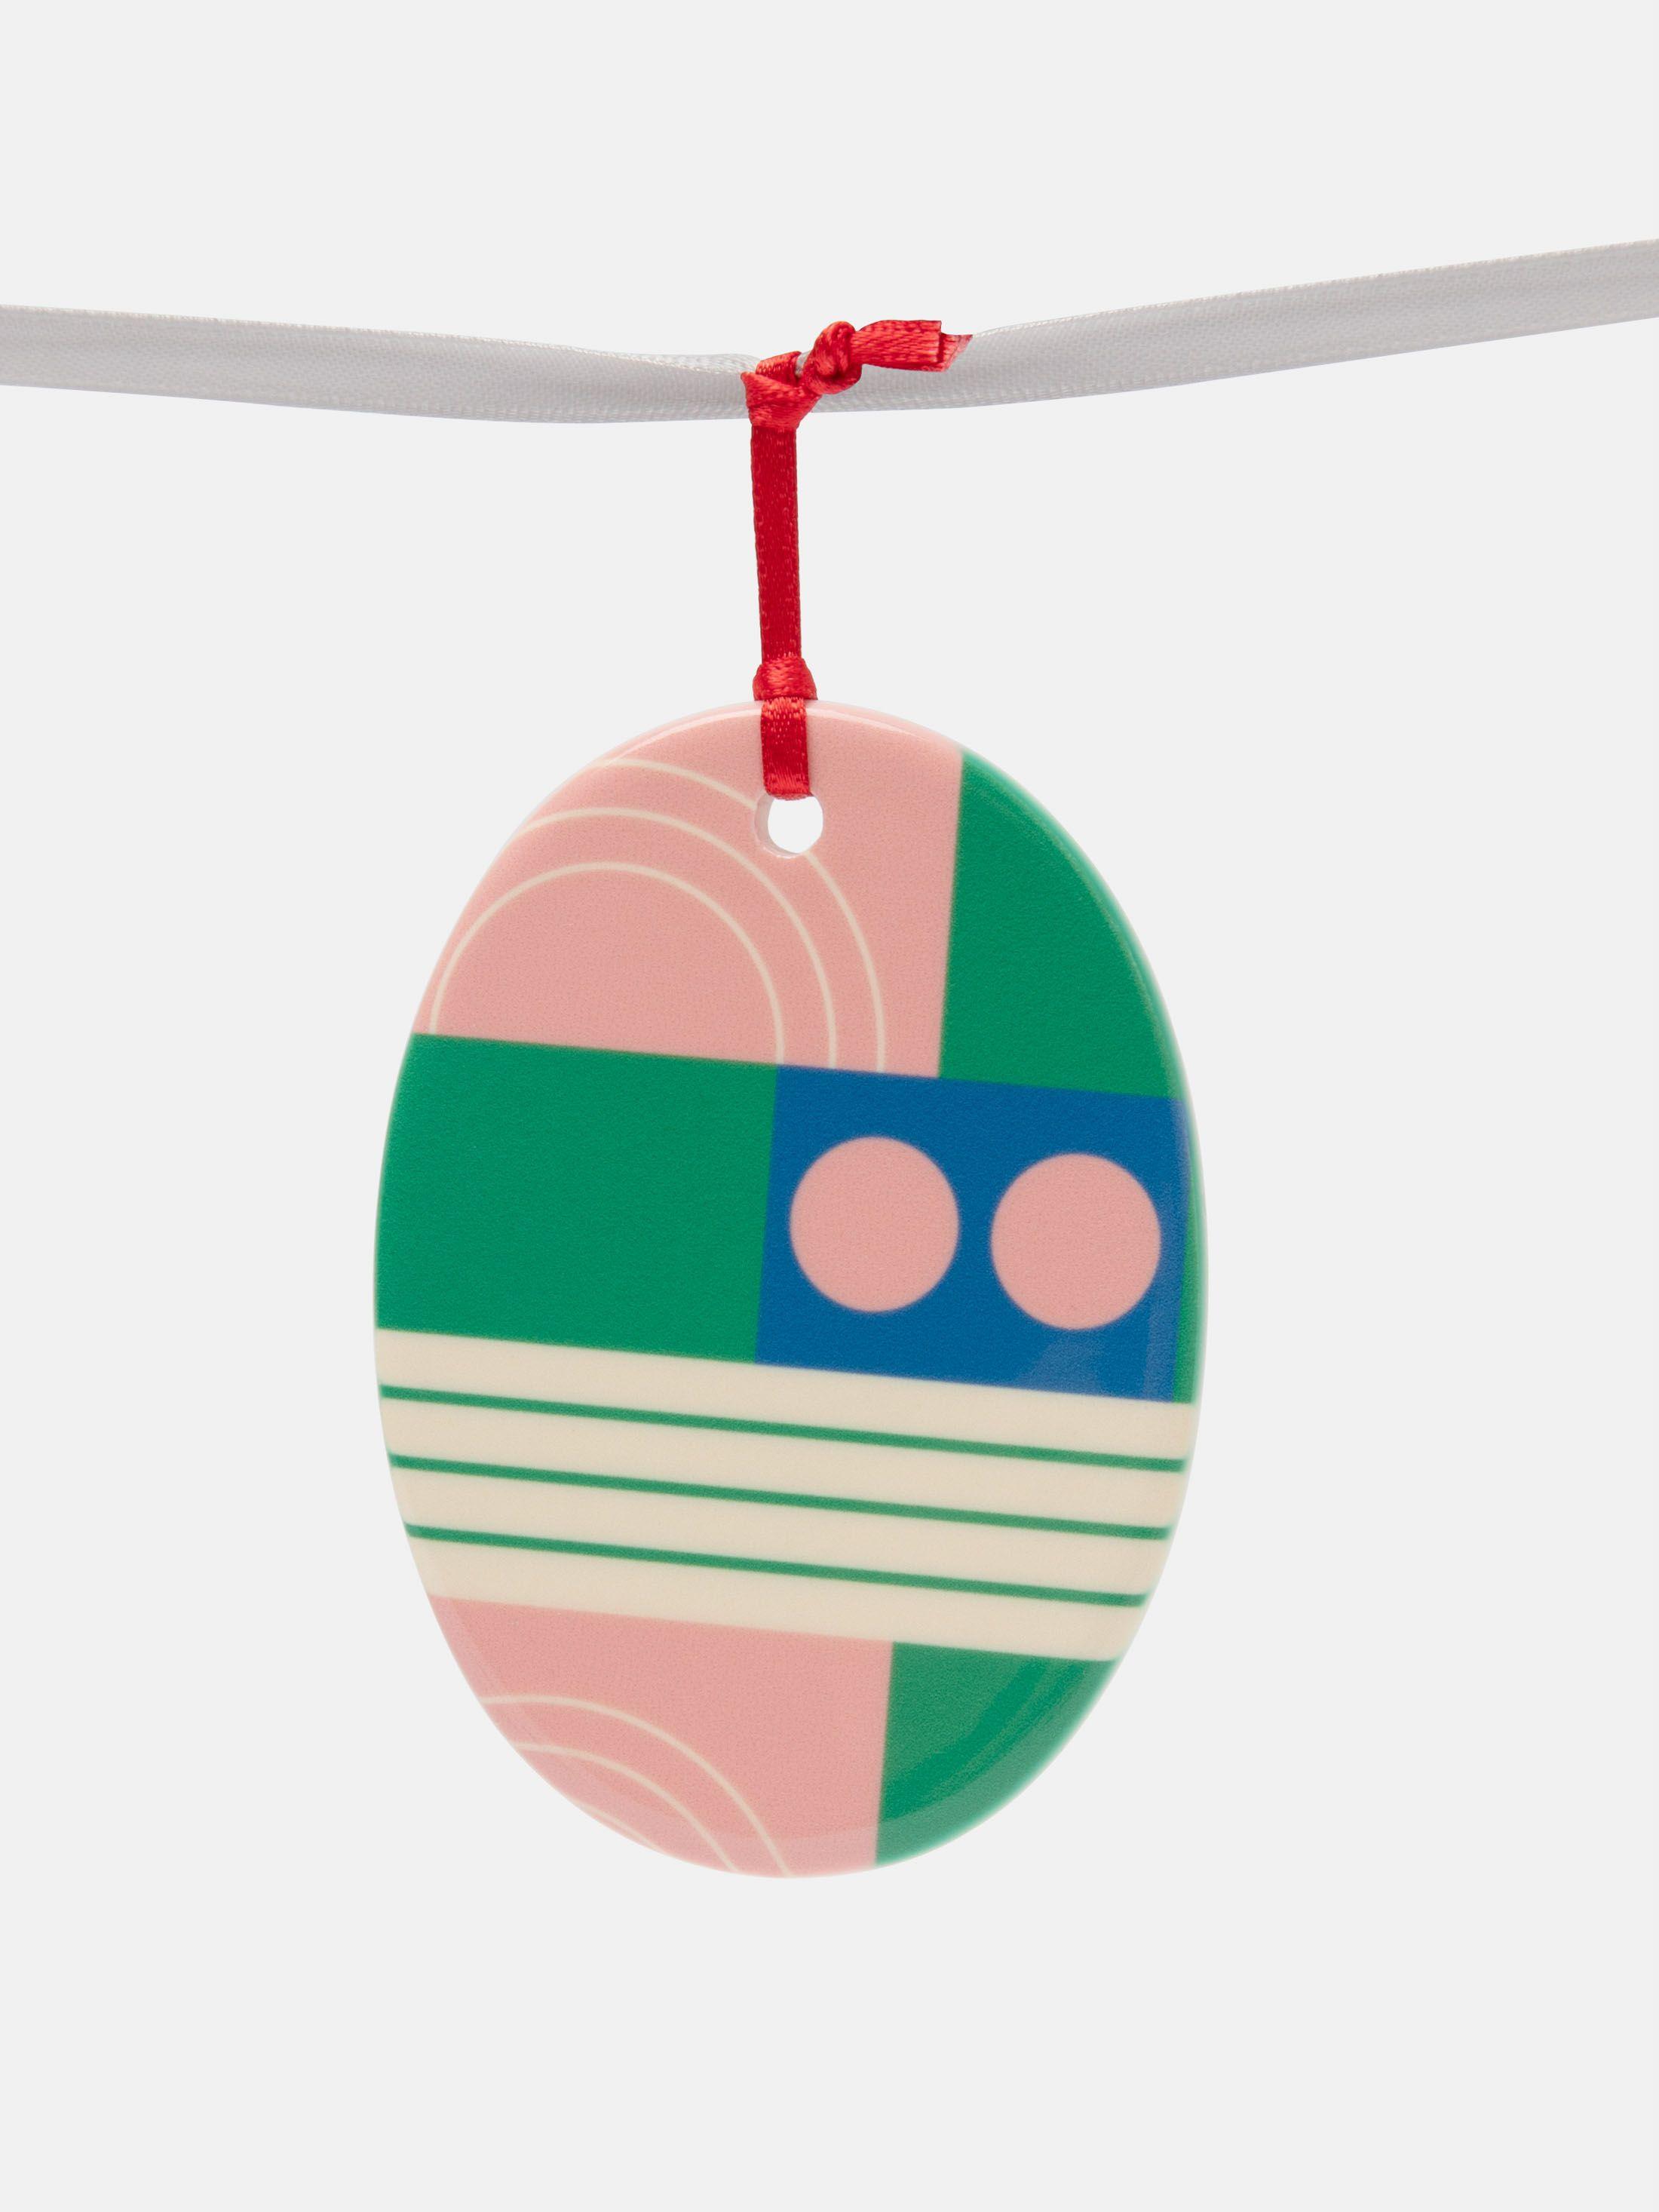 Weihnachtsanhänger individuell bedrucken